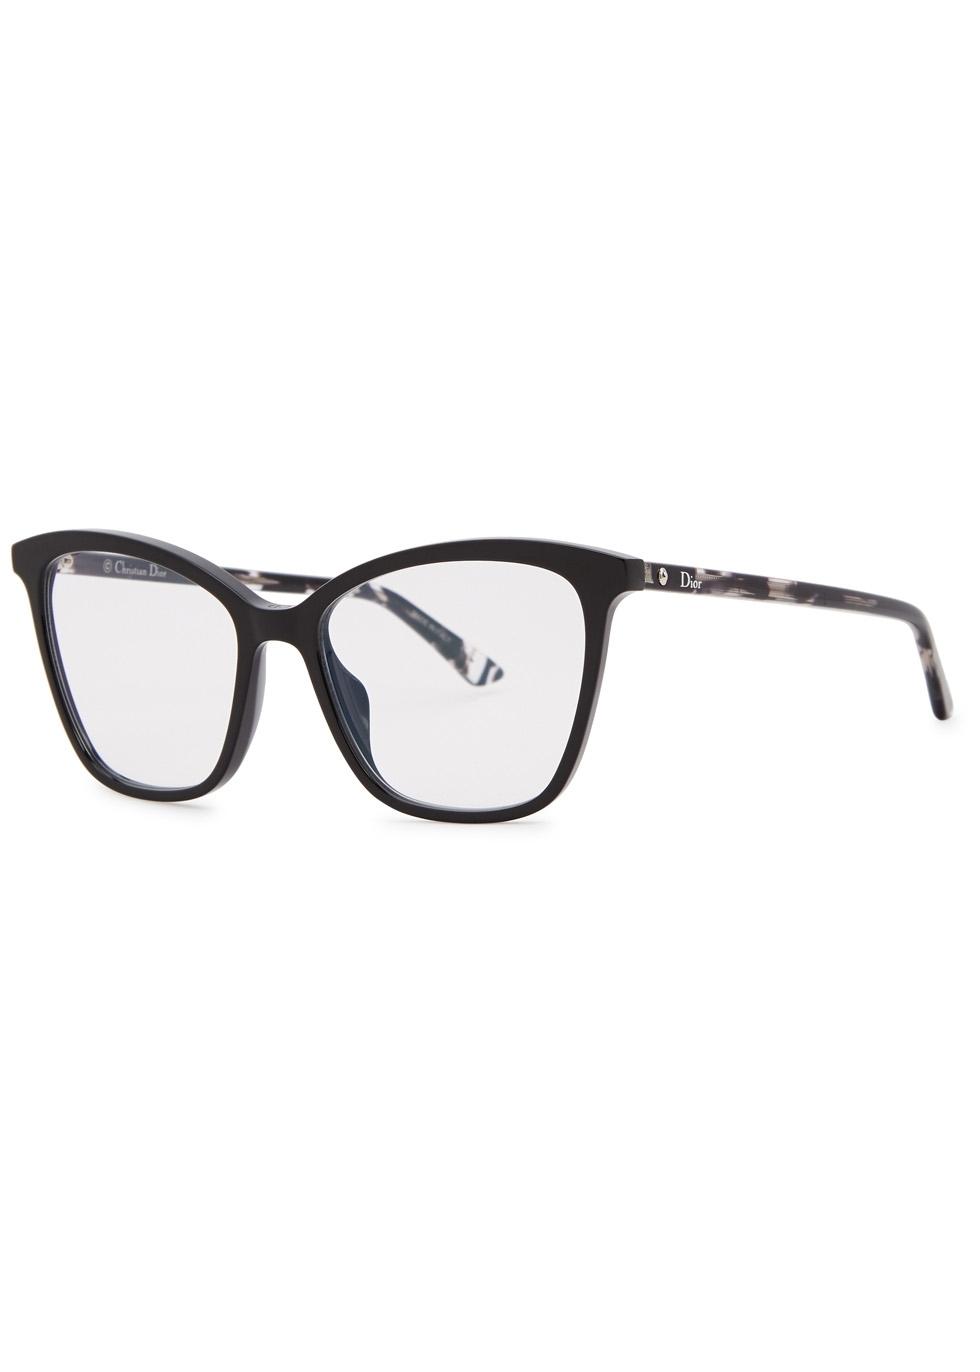 Women\'s Optical Frames - Designer Glasses - Harvey Nichols